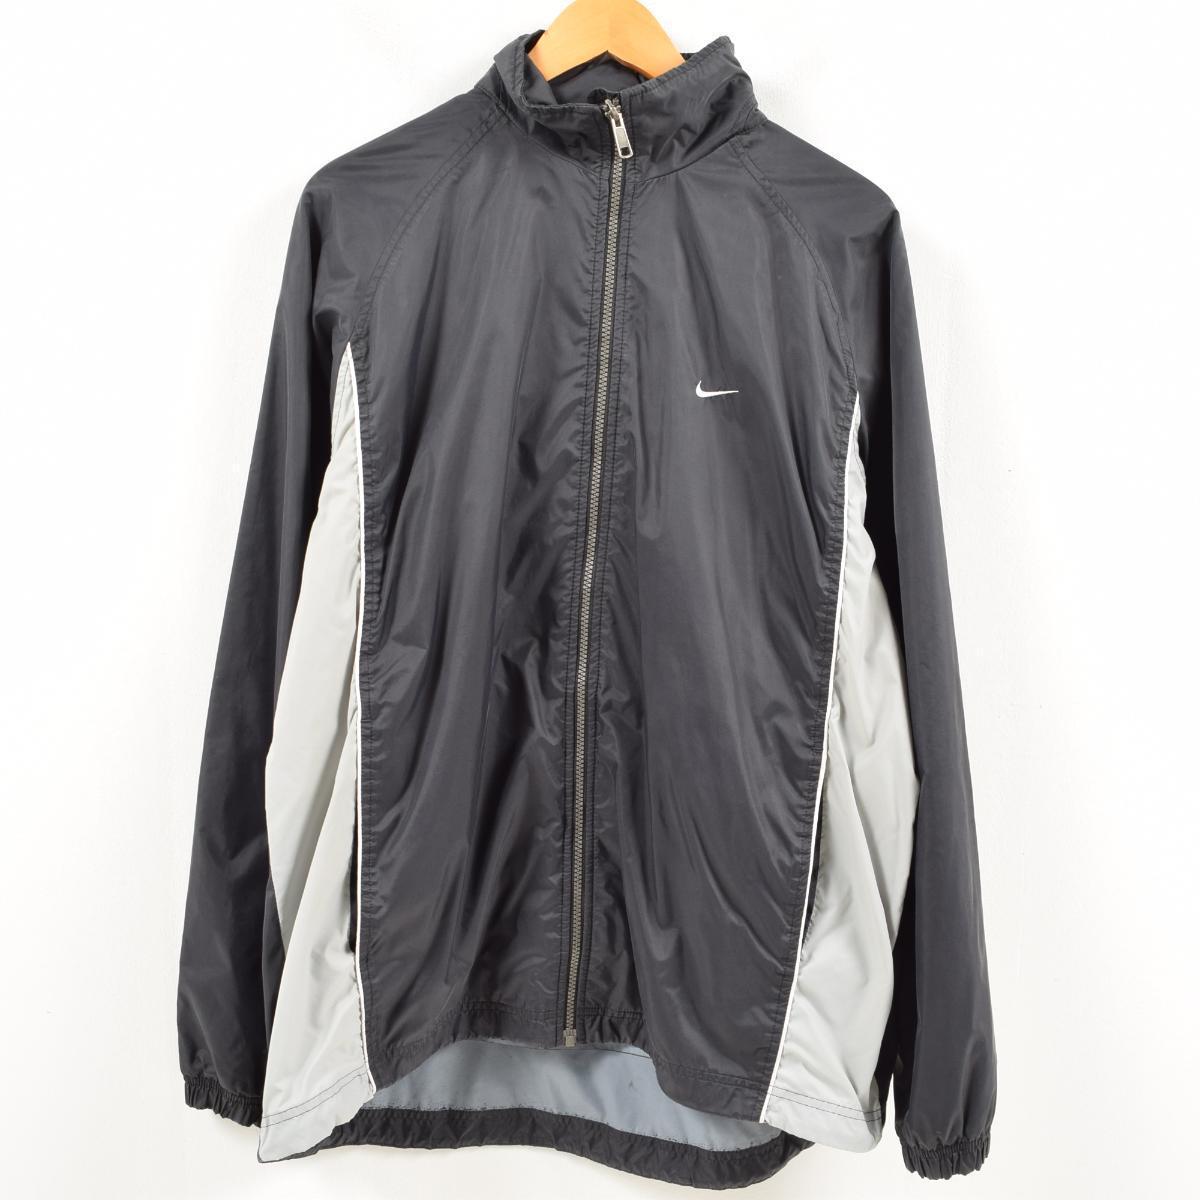 c53dd12d9c VINTAGE CLOTHING JAM  Nike NIKE food storing type nylon jacket men ...